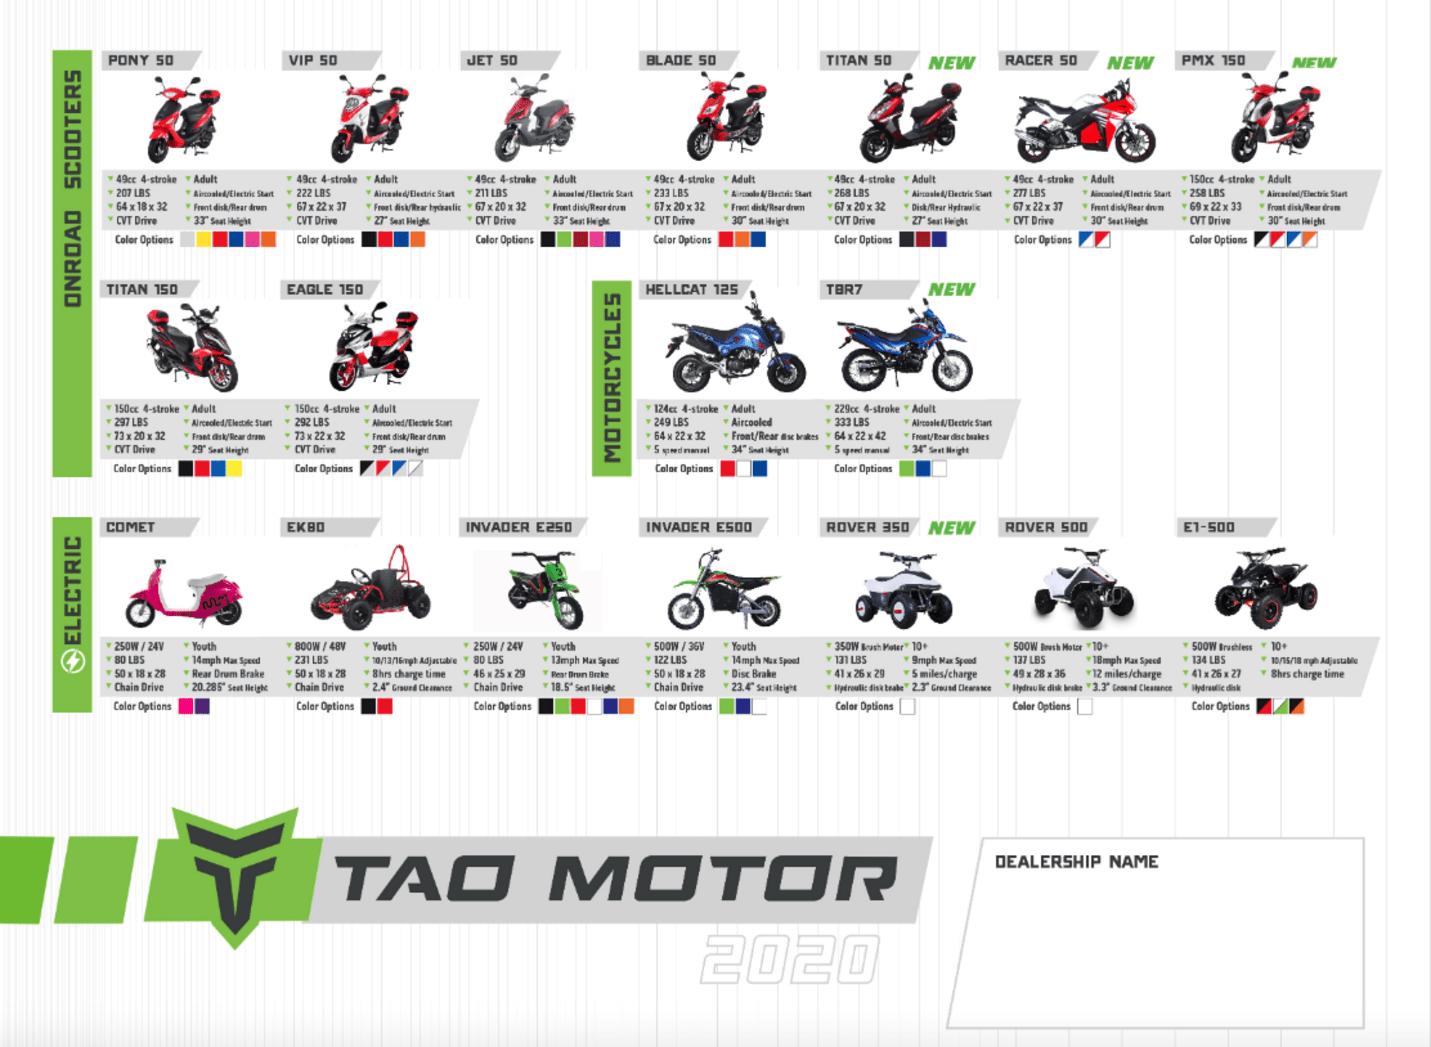 2019-11-13_TaoMotor_Brochure